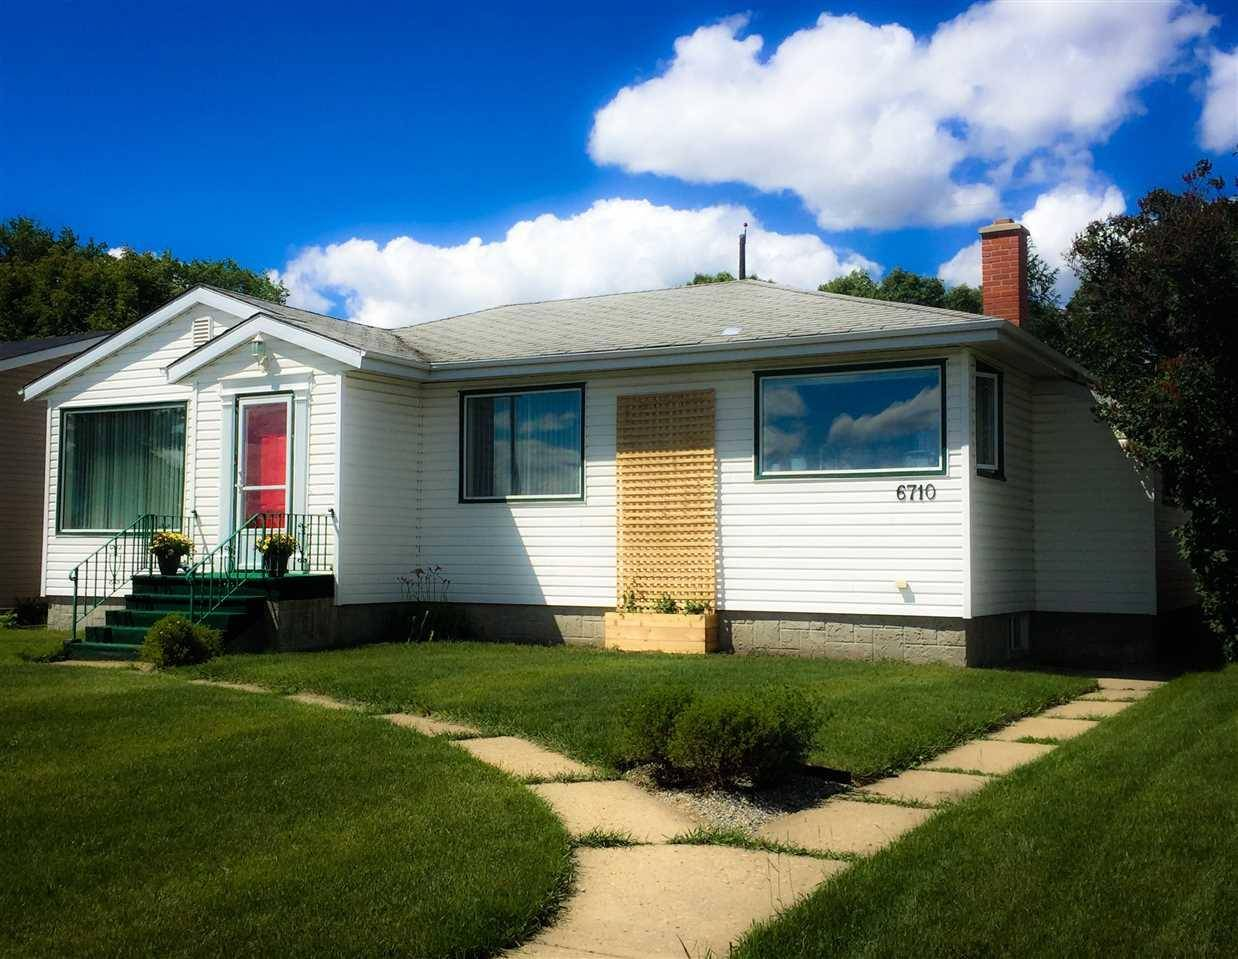 House for sale at 6710 Ada Blvd Nw Edmonton Alberta - MLS: E4178498